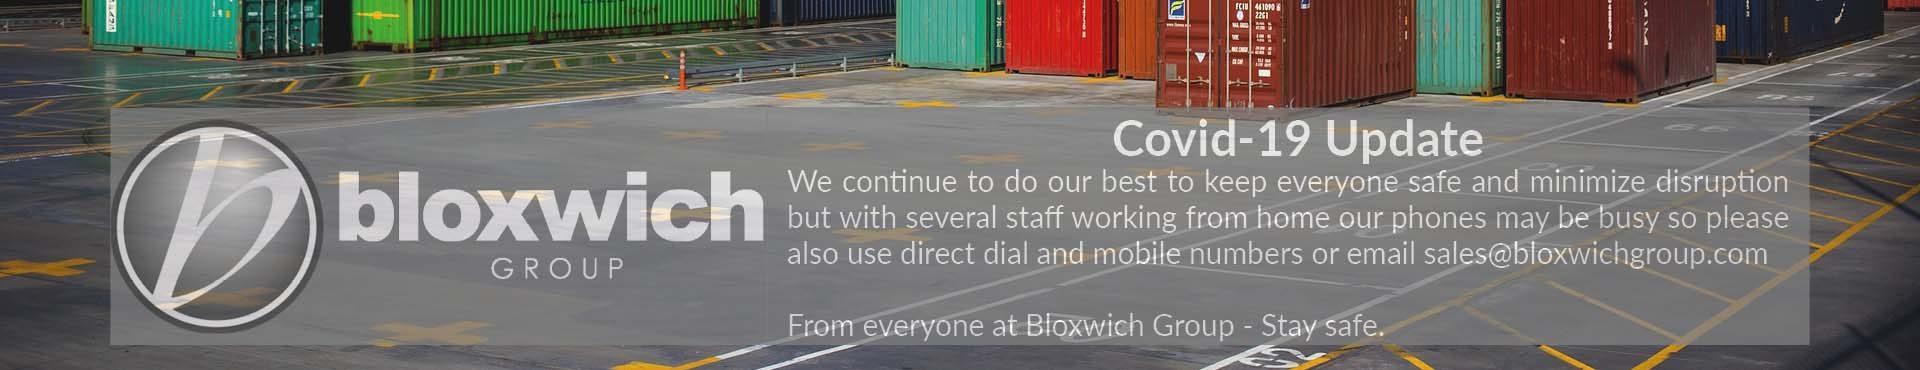 Bloxwich Group Coronavirus Update Website Slider Image